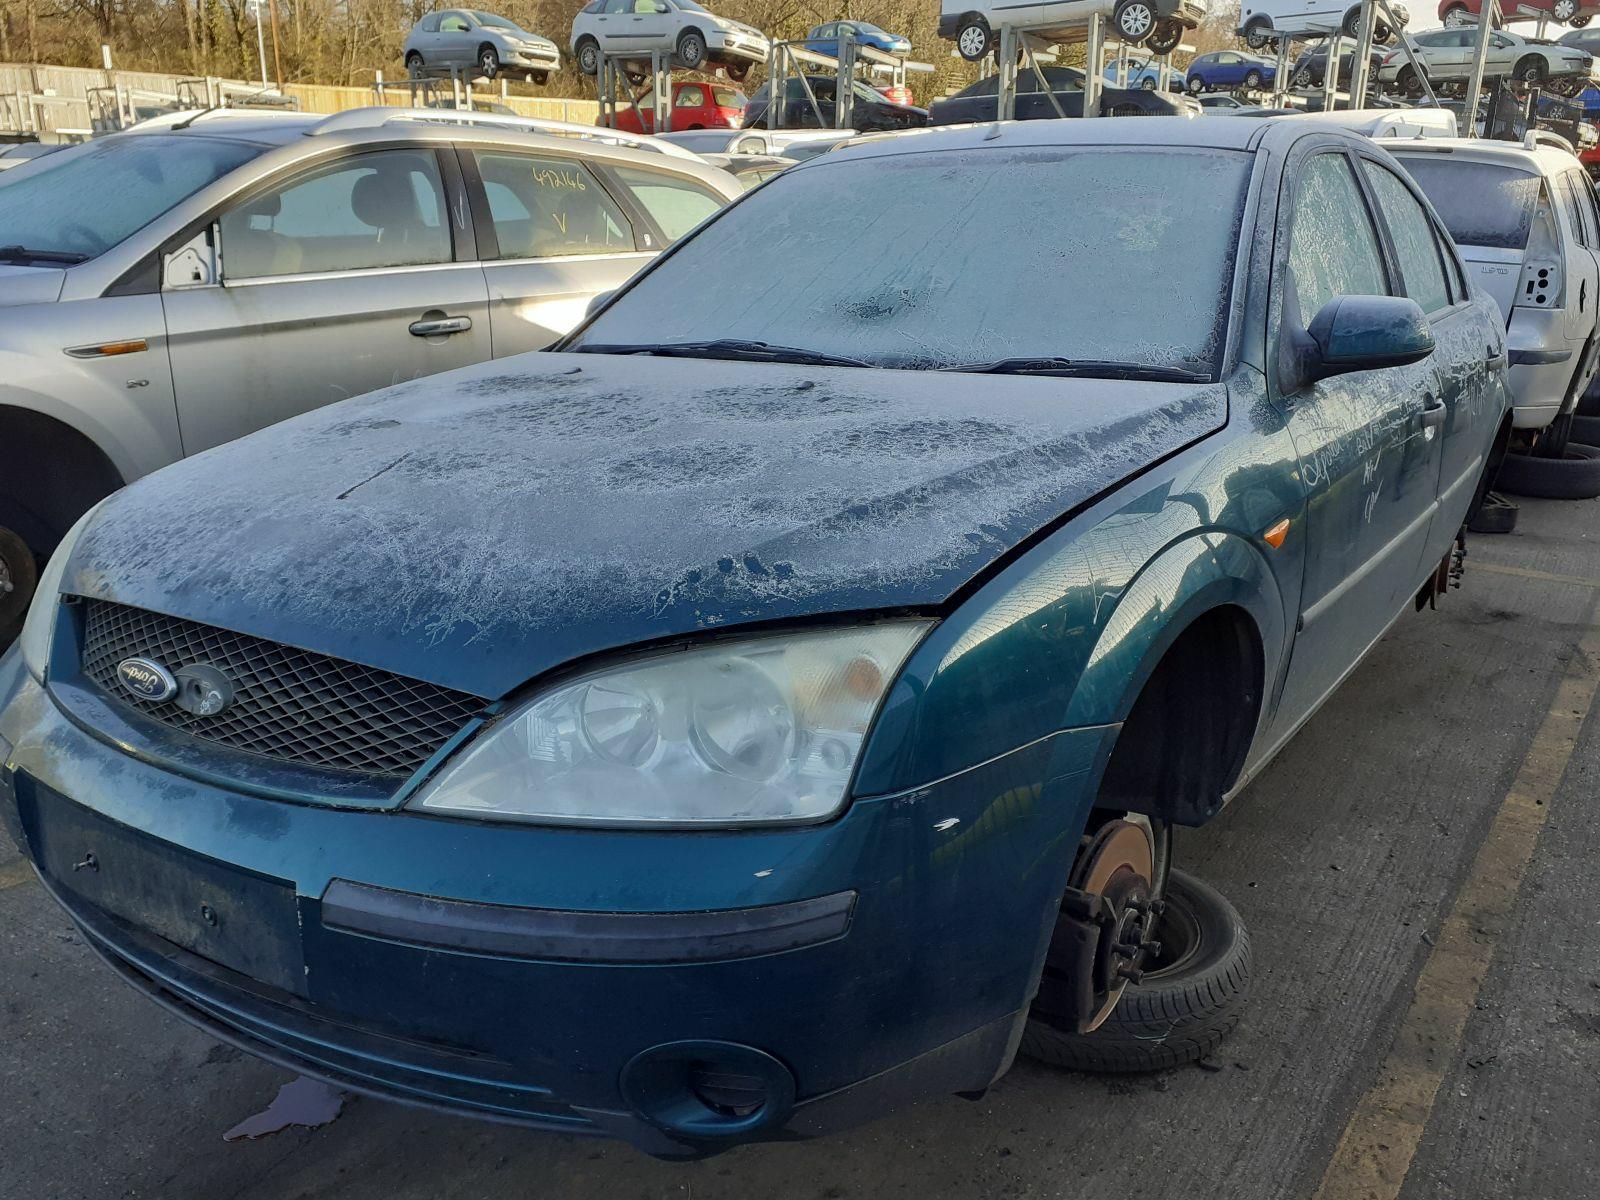 Ford Mondeo 2001 To 2003 LX 5 Door Hatchback